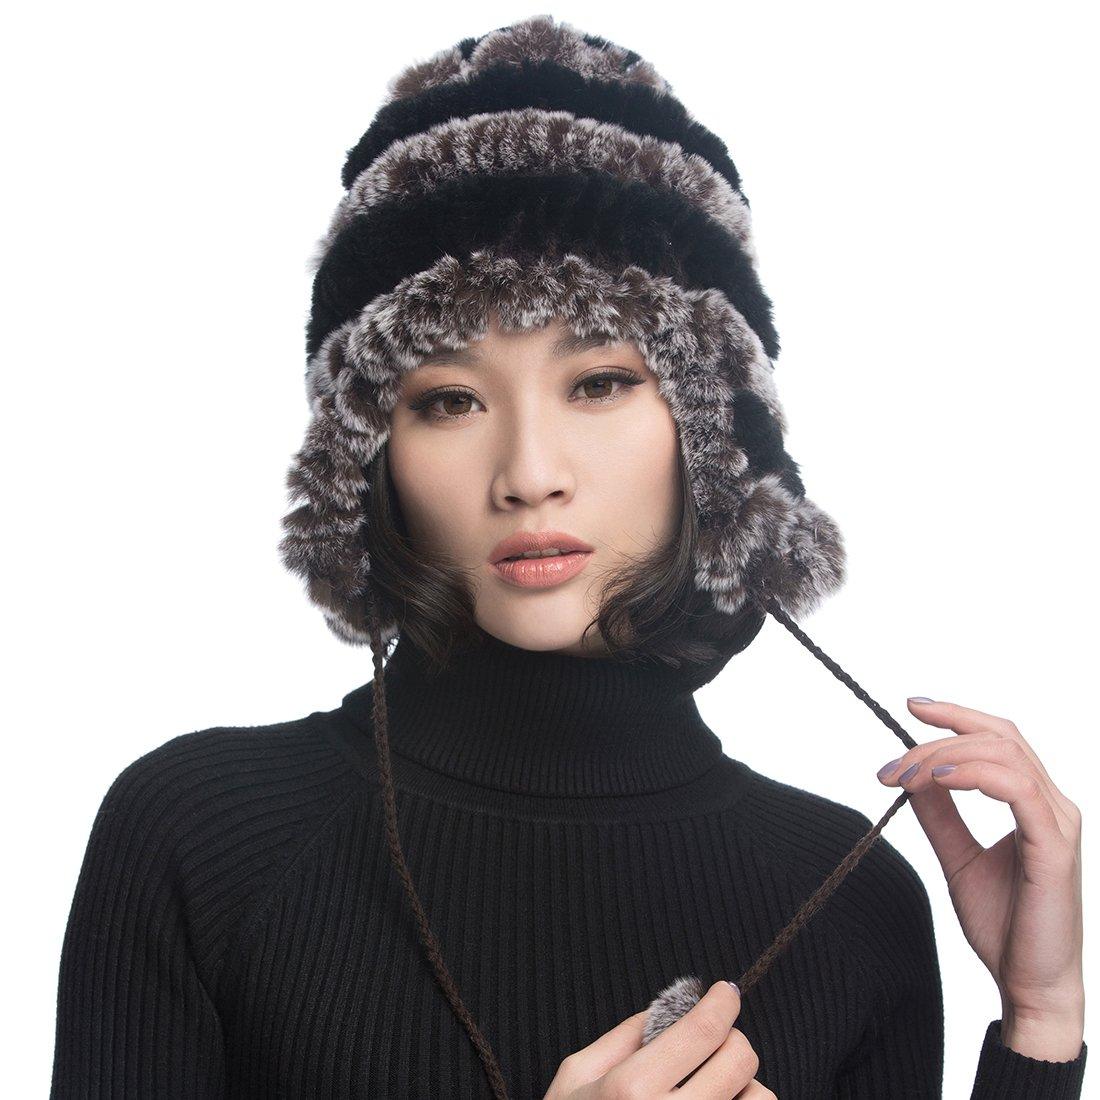 URSFUR Women's Rex Rabbit Fur Hats Winter Ear Cap Flexible Multicolor (Coffee & Black)